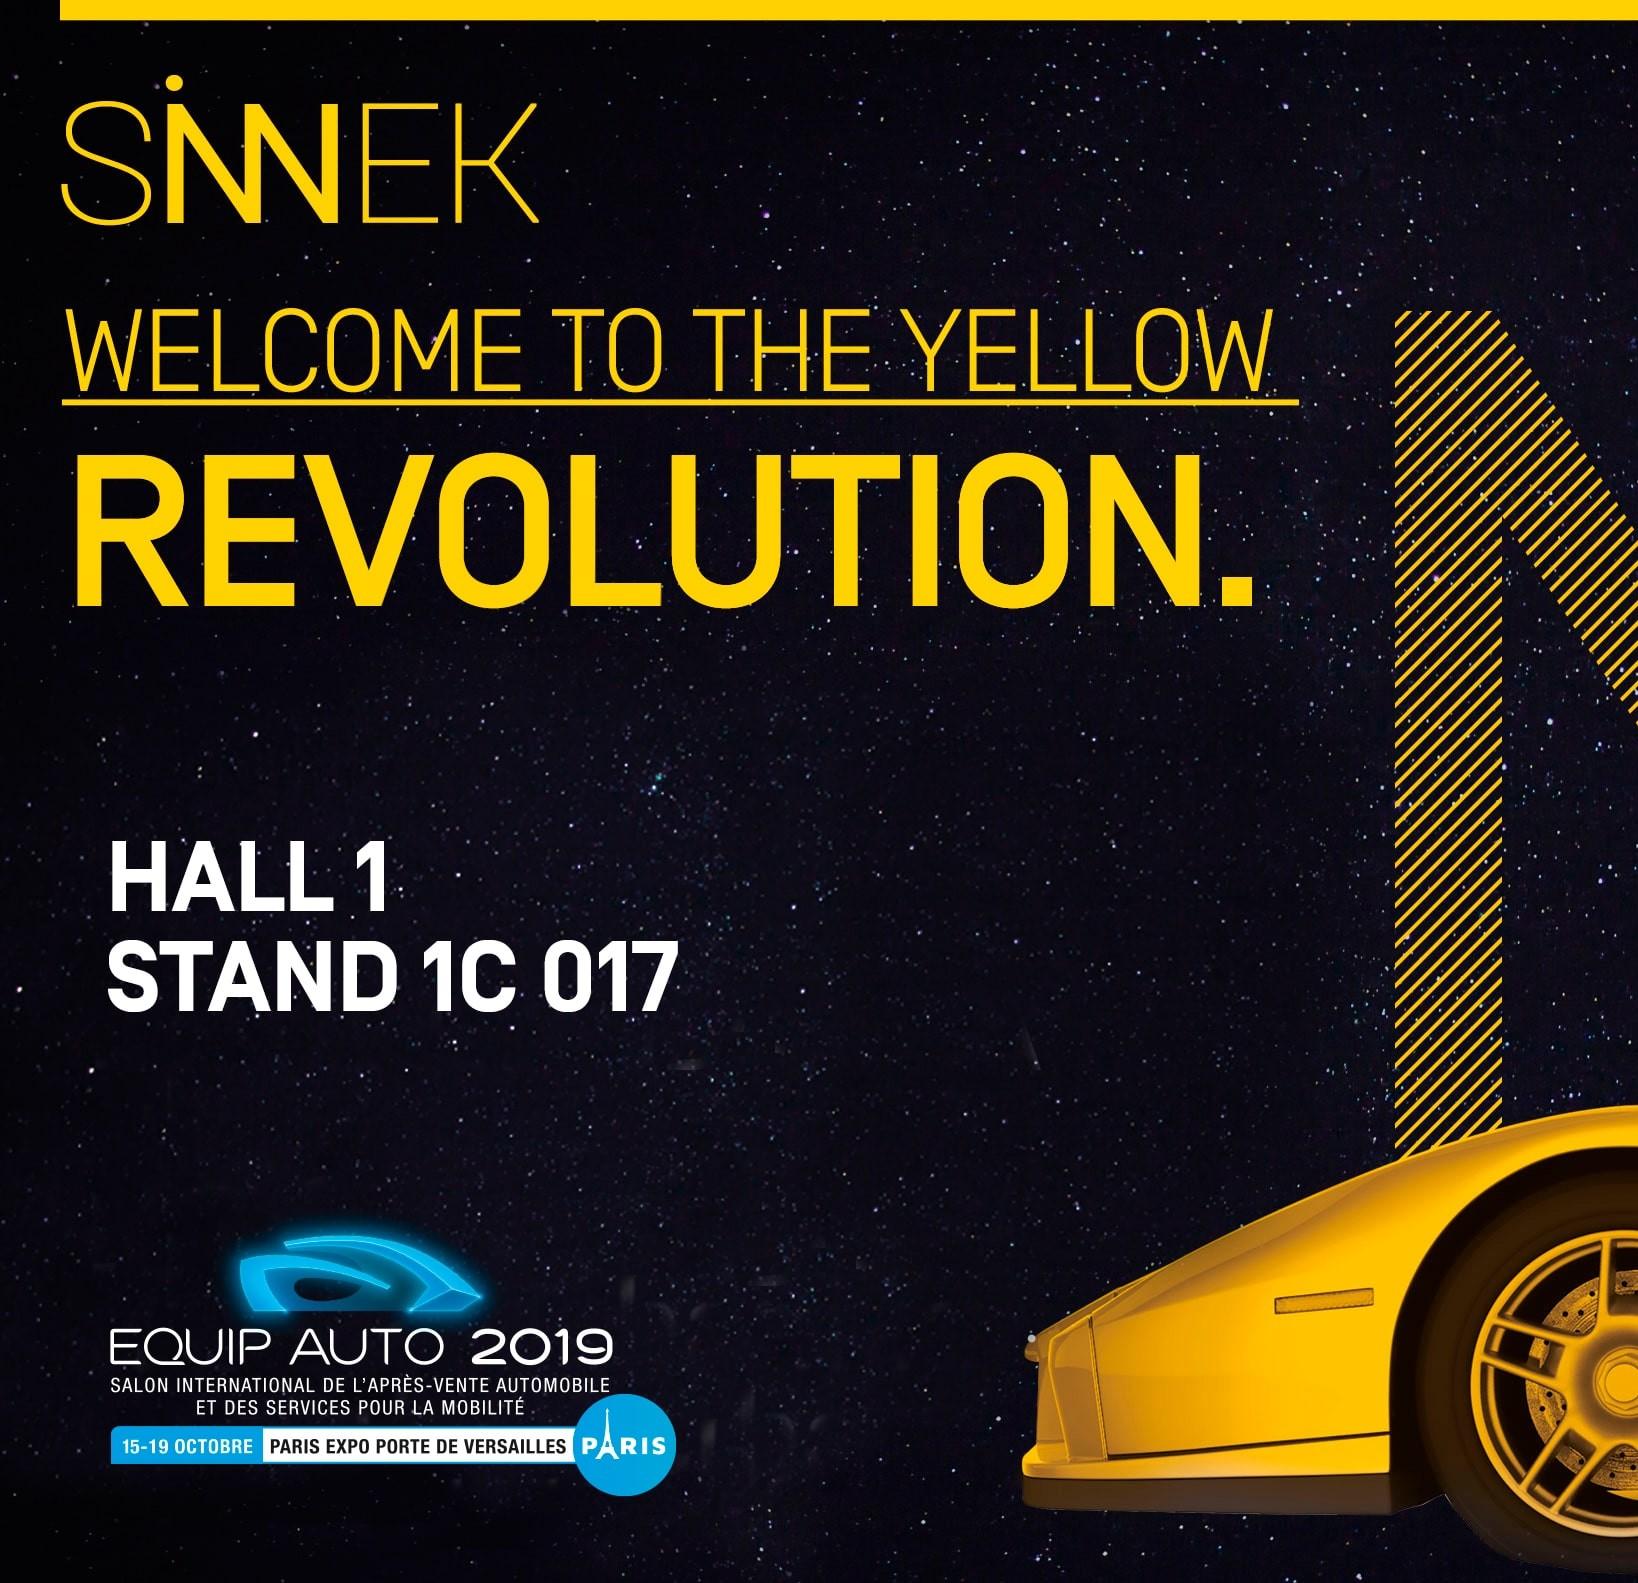 SINNEK estará en la Feria EquipAuto 2019